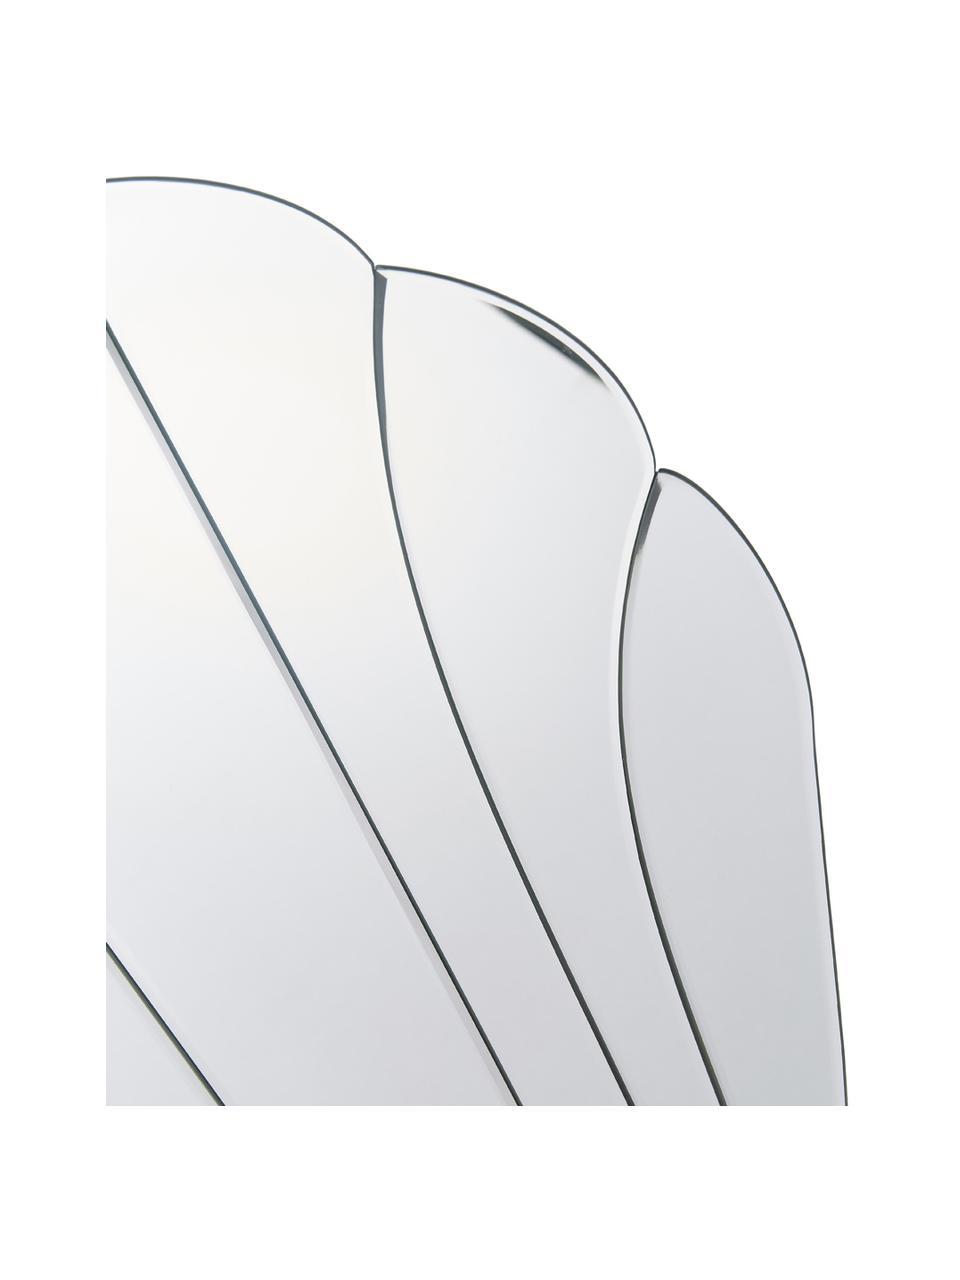 Rahmenloser Wandspiegel Helix in Muschelform, Spiegelfläche: Spiegelglas, Spiegelglas, 50 x 60 cm